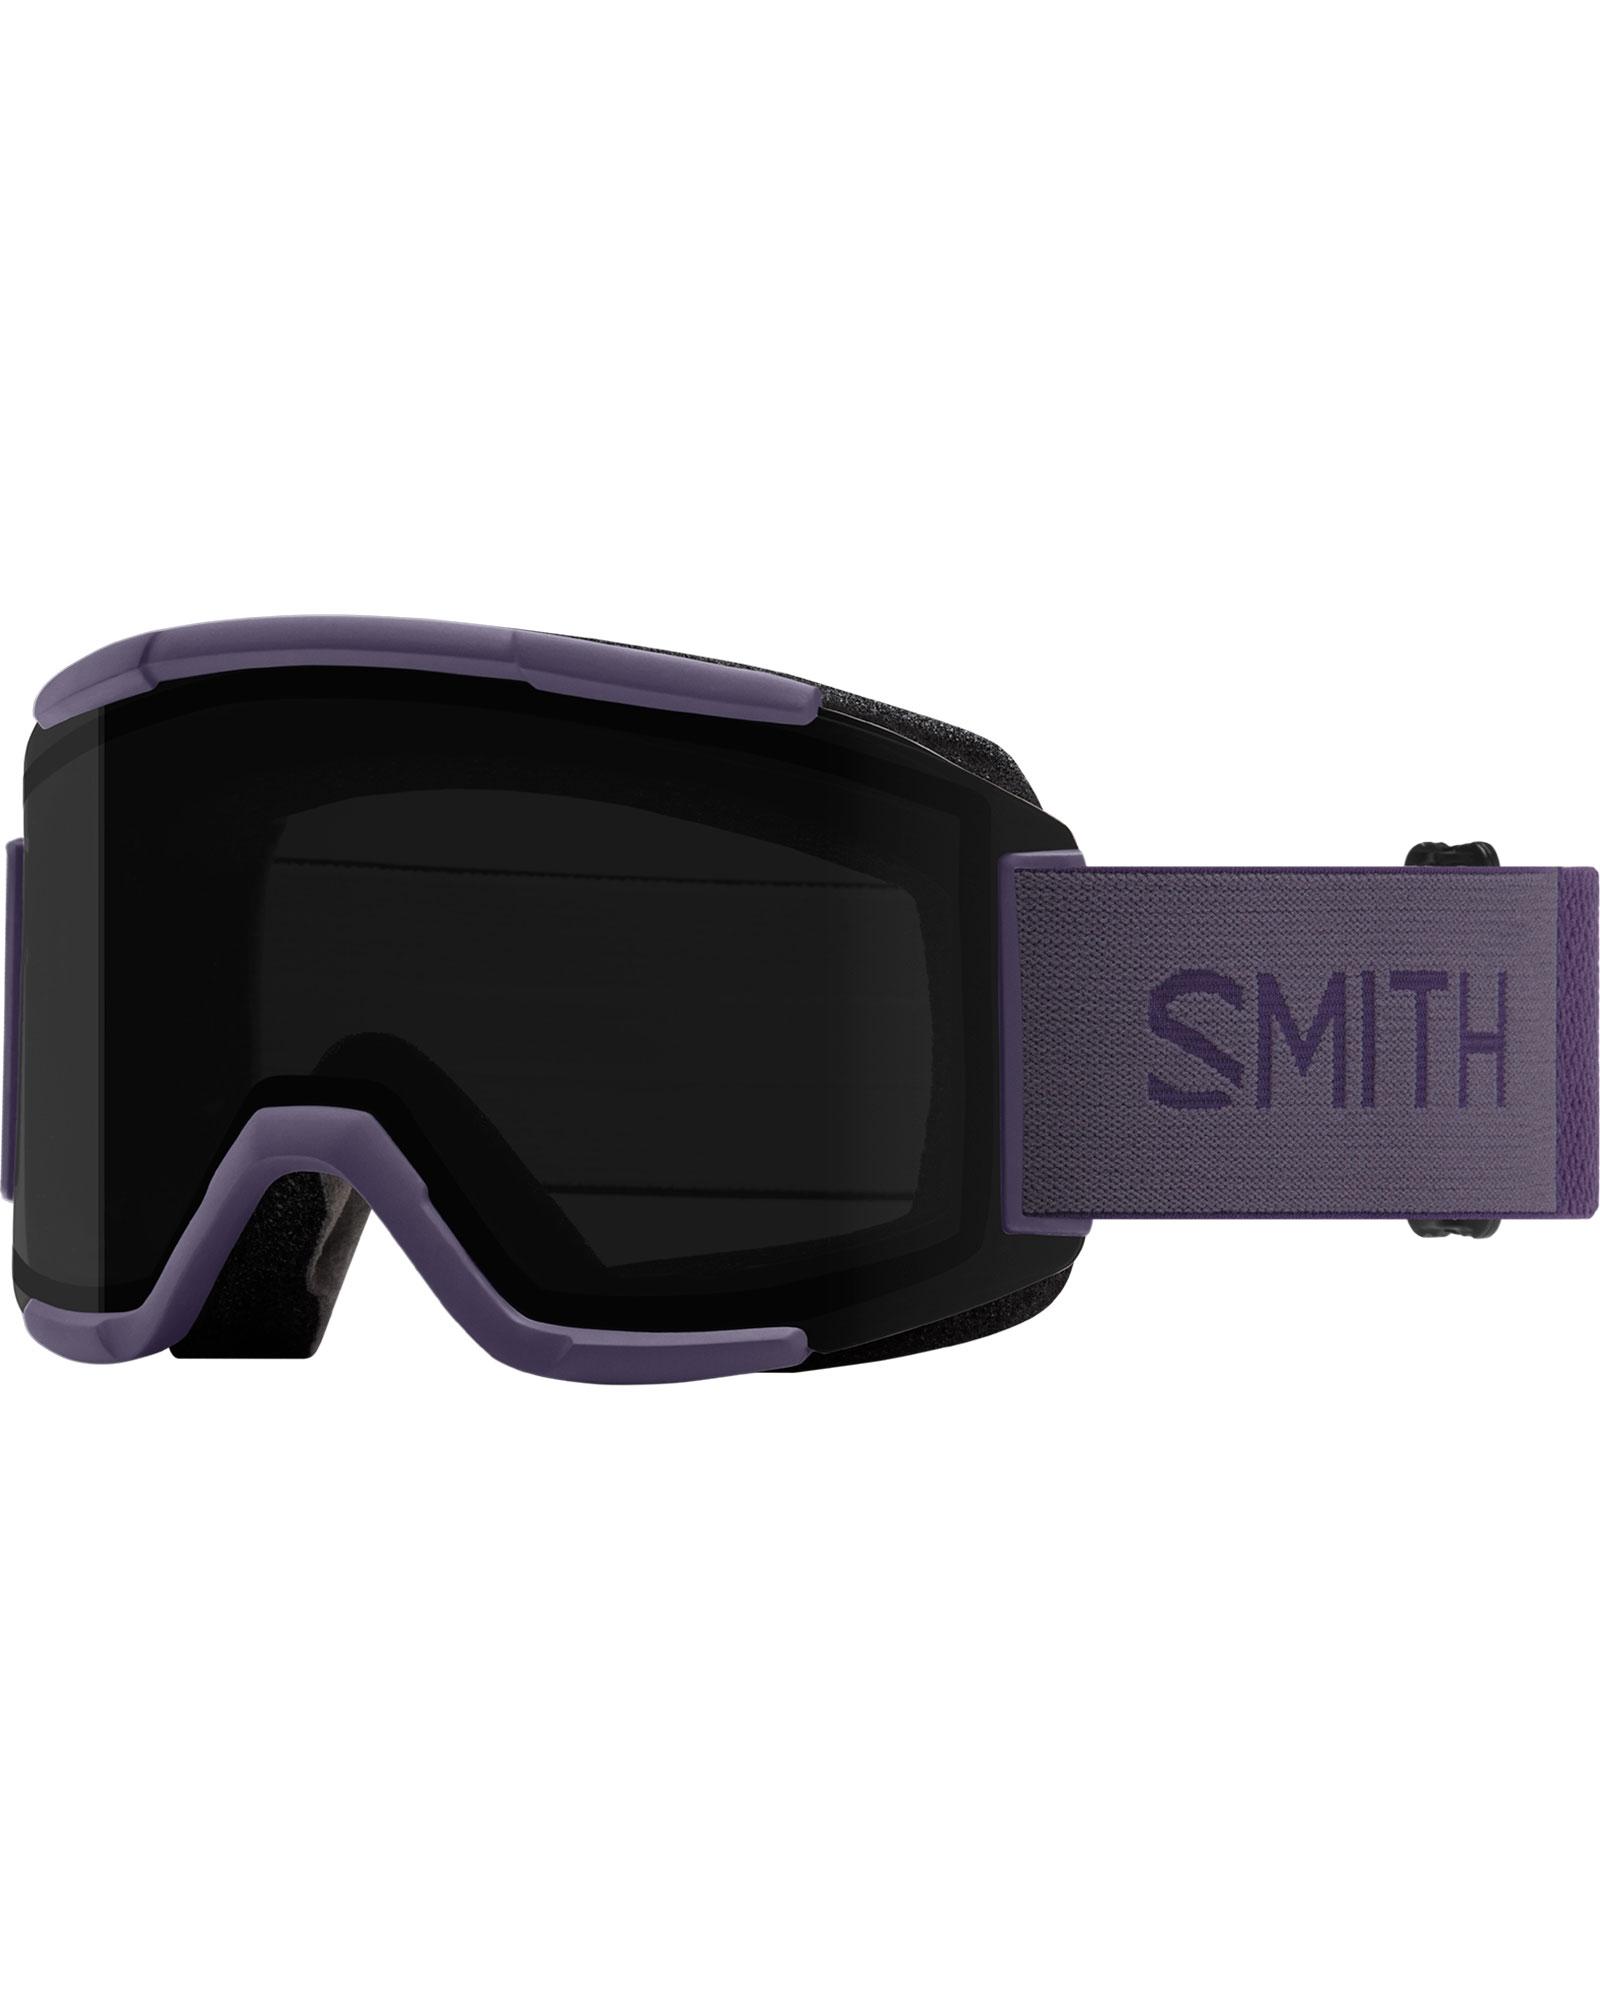 Salomon Driver Ski Helmet 2020 / 2021